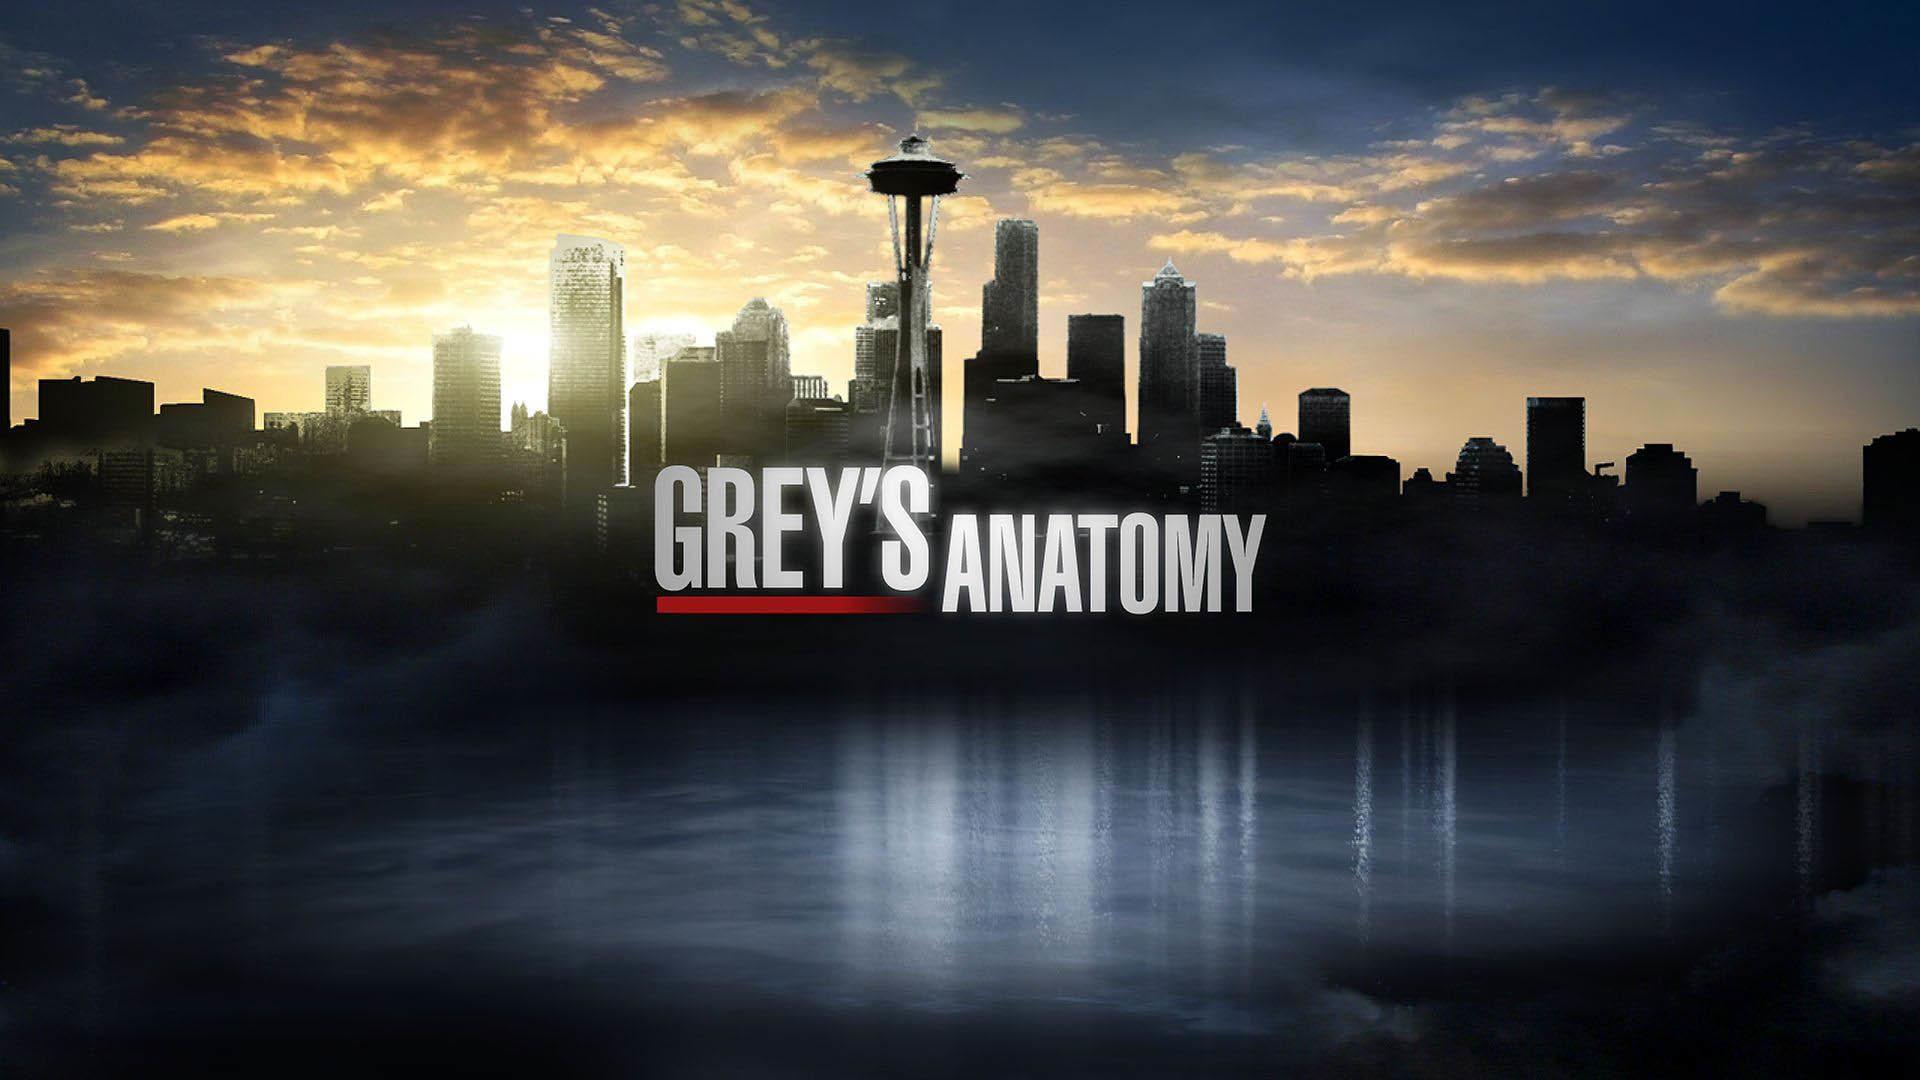 Grey's Anatomy Logo wallpaper